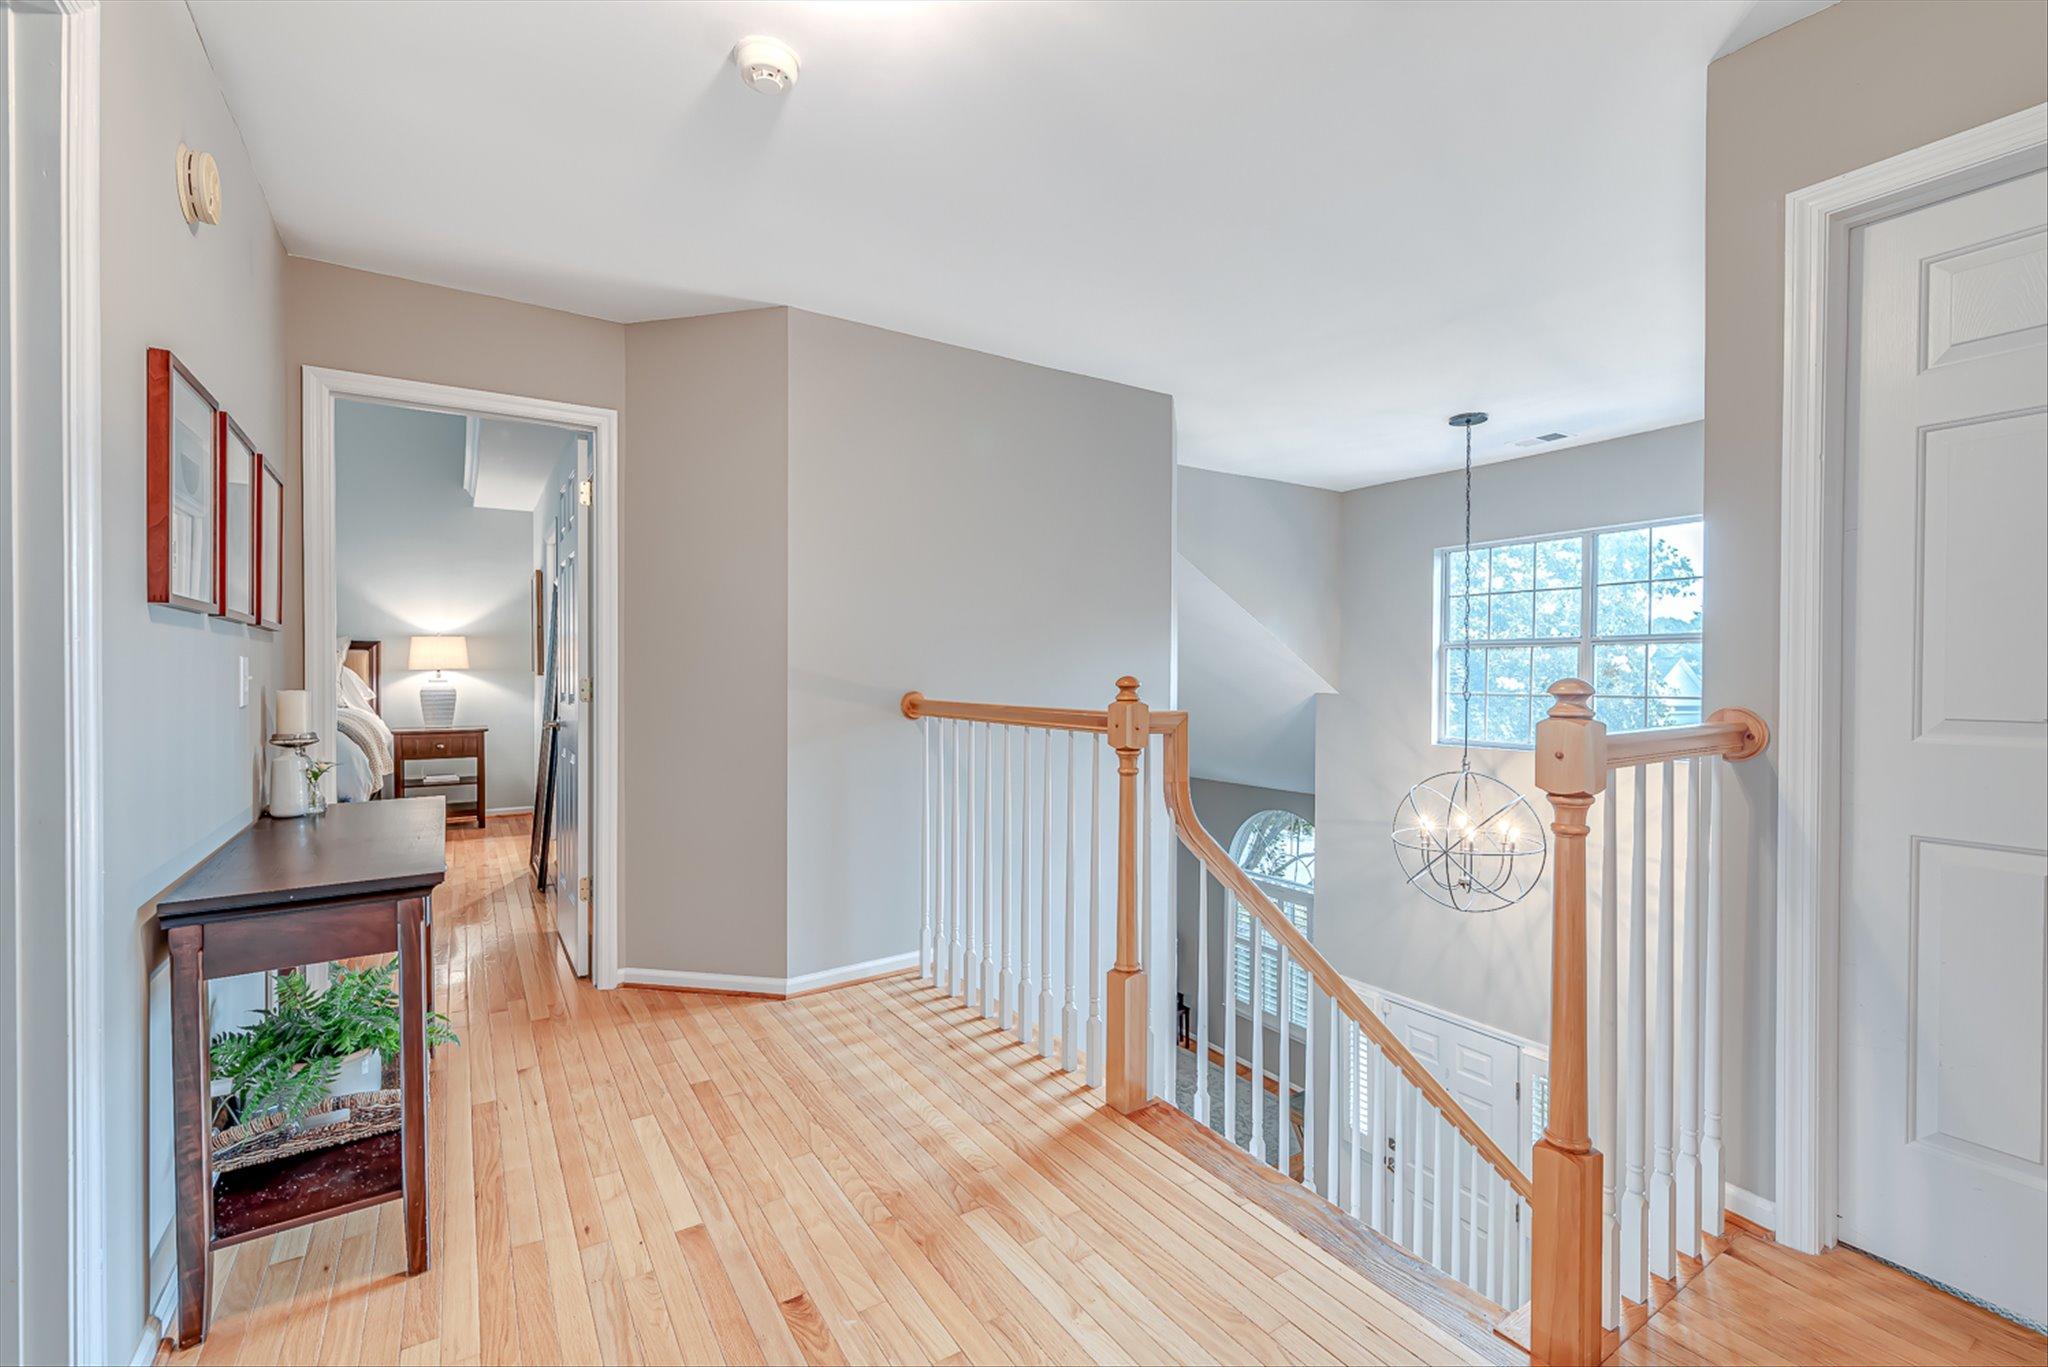 Belle Hall Homes For Sale - 278 Jardinere, Mount Pleasant, SC - 6